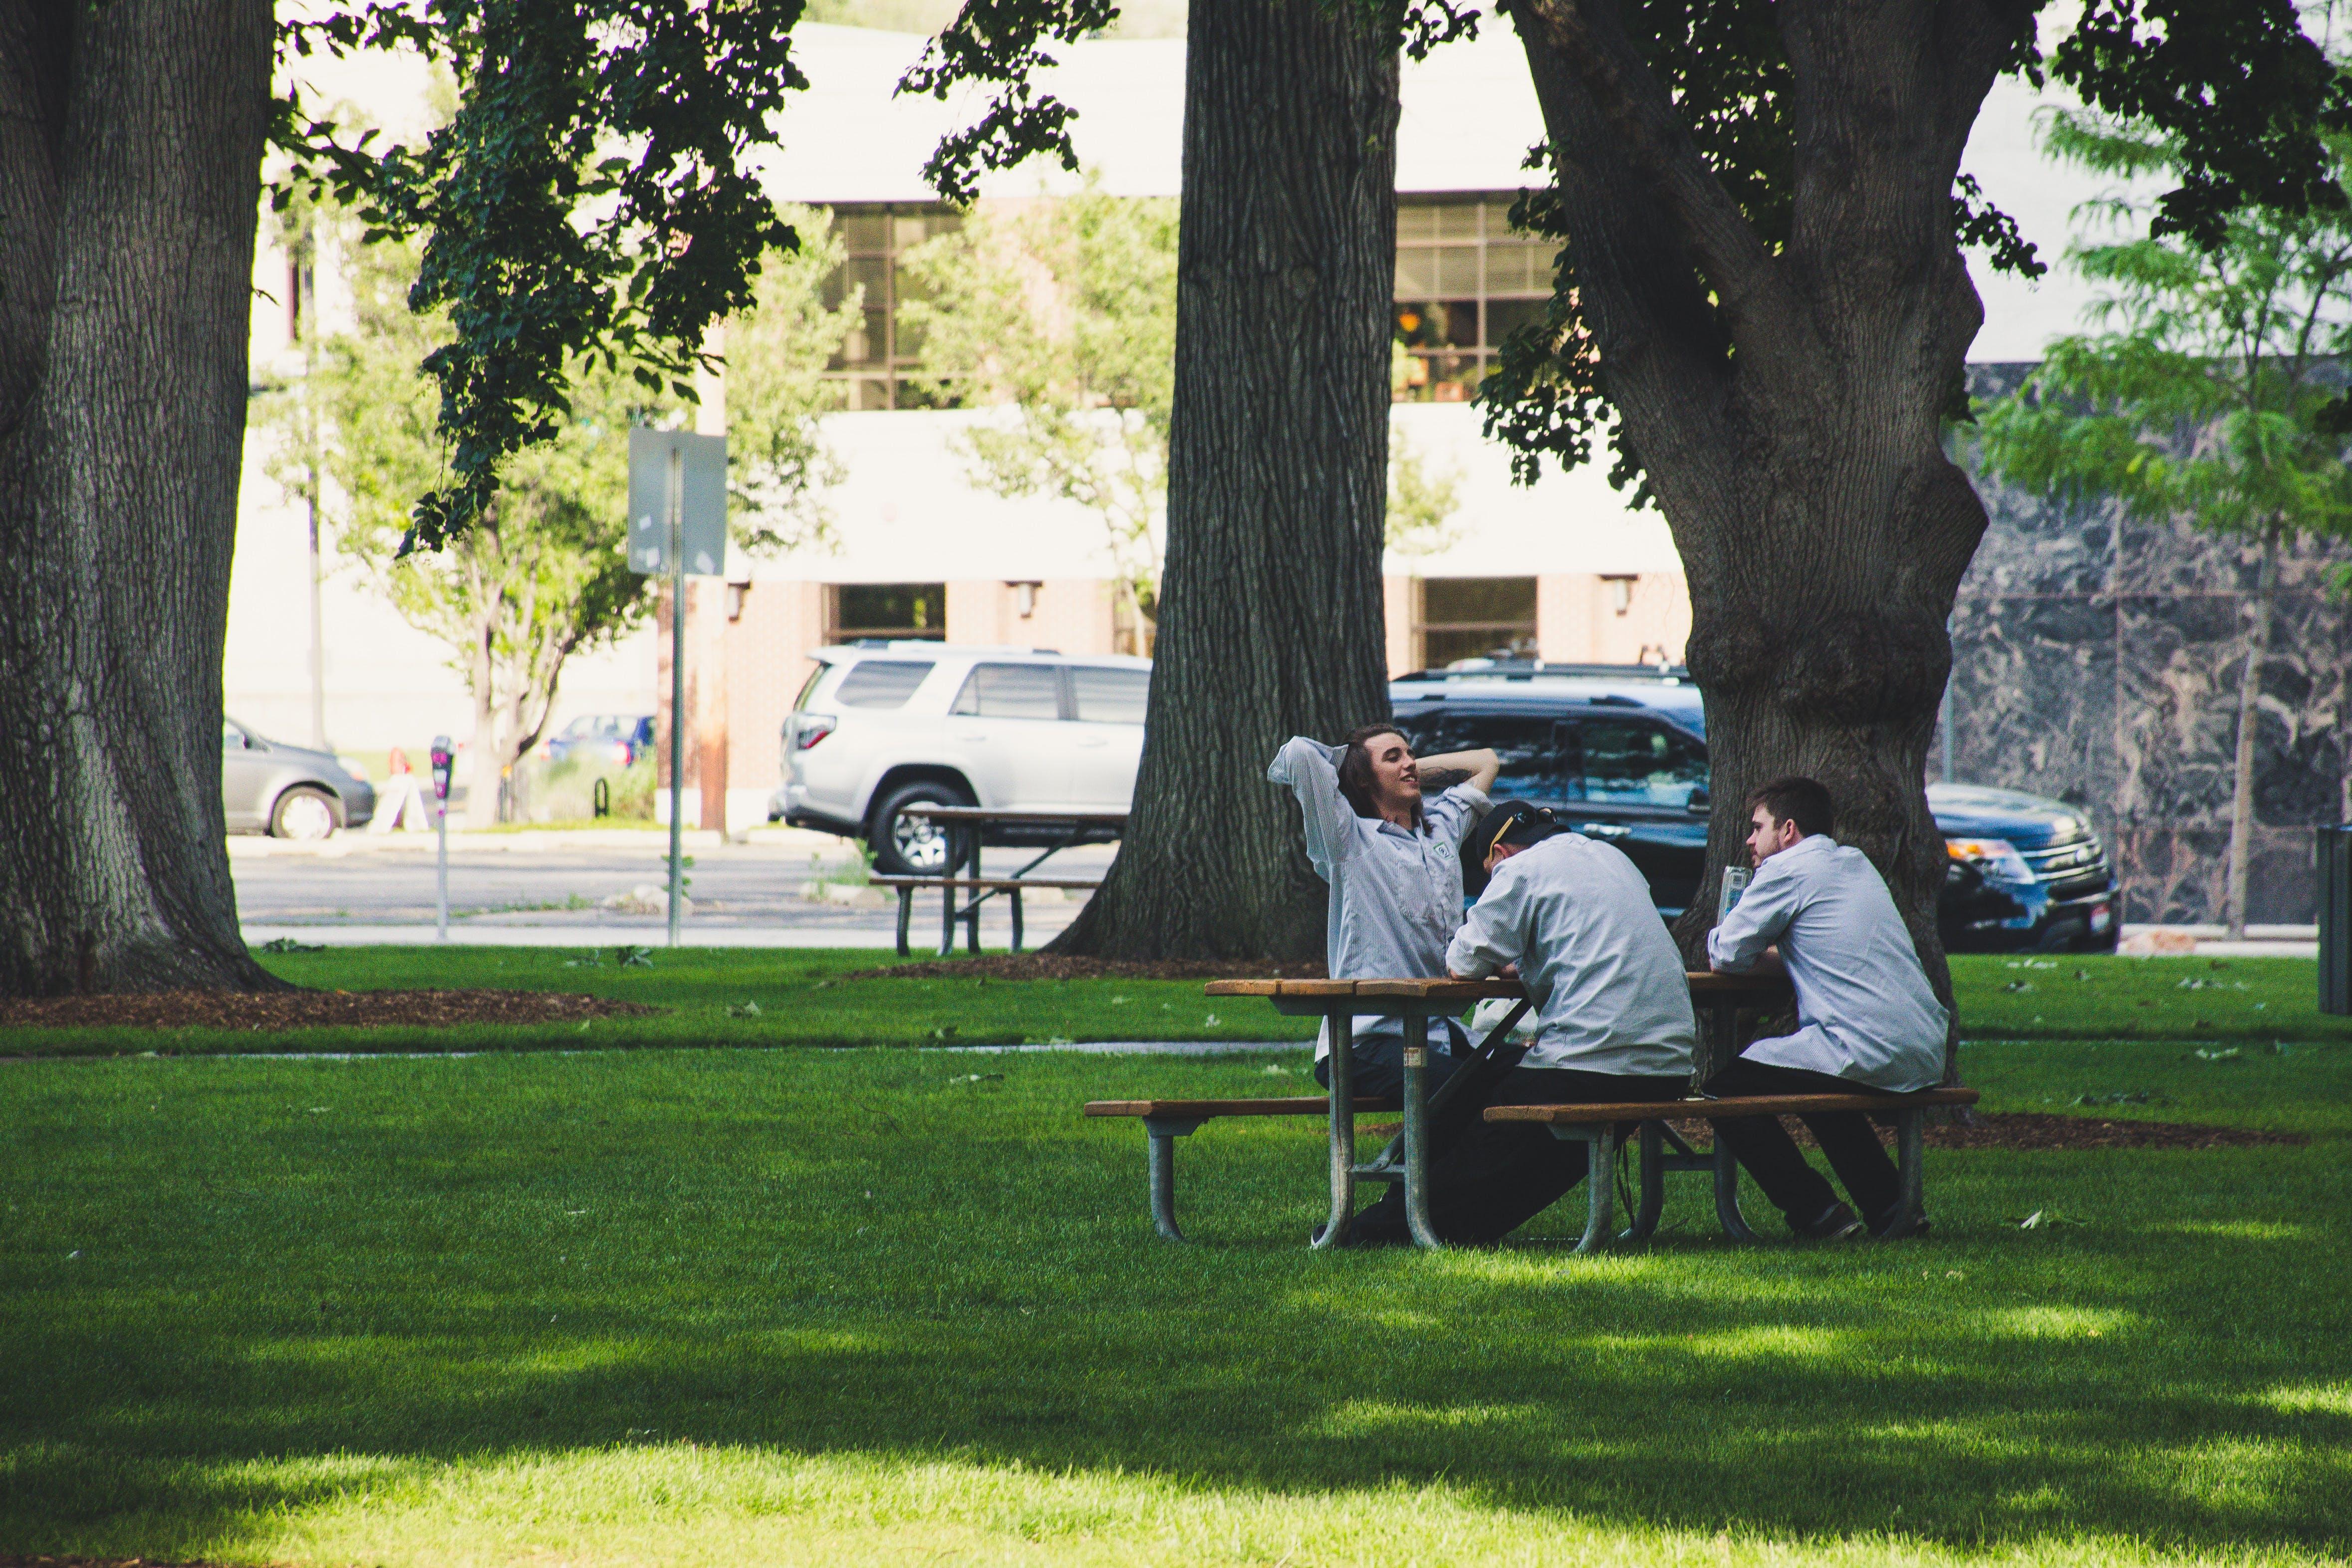 Photo Of Men Sitting On Picnic Bench